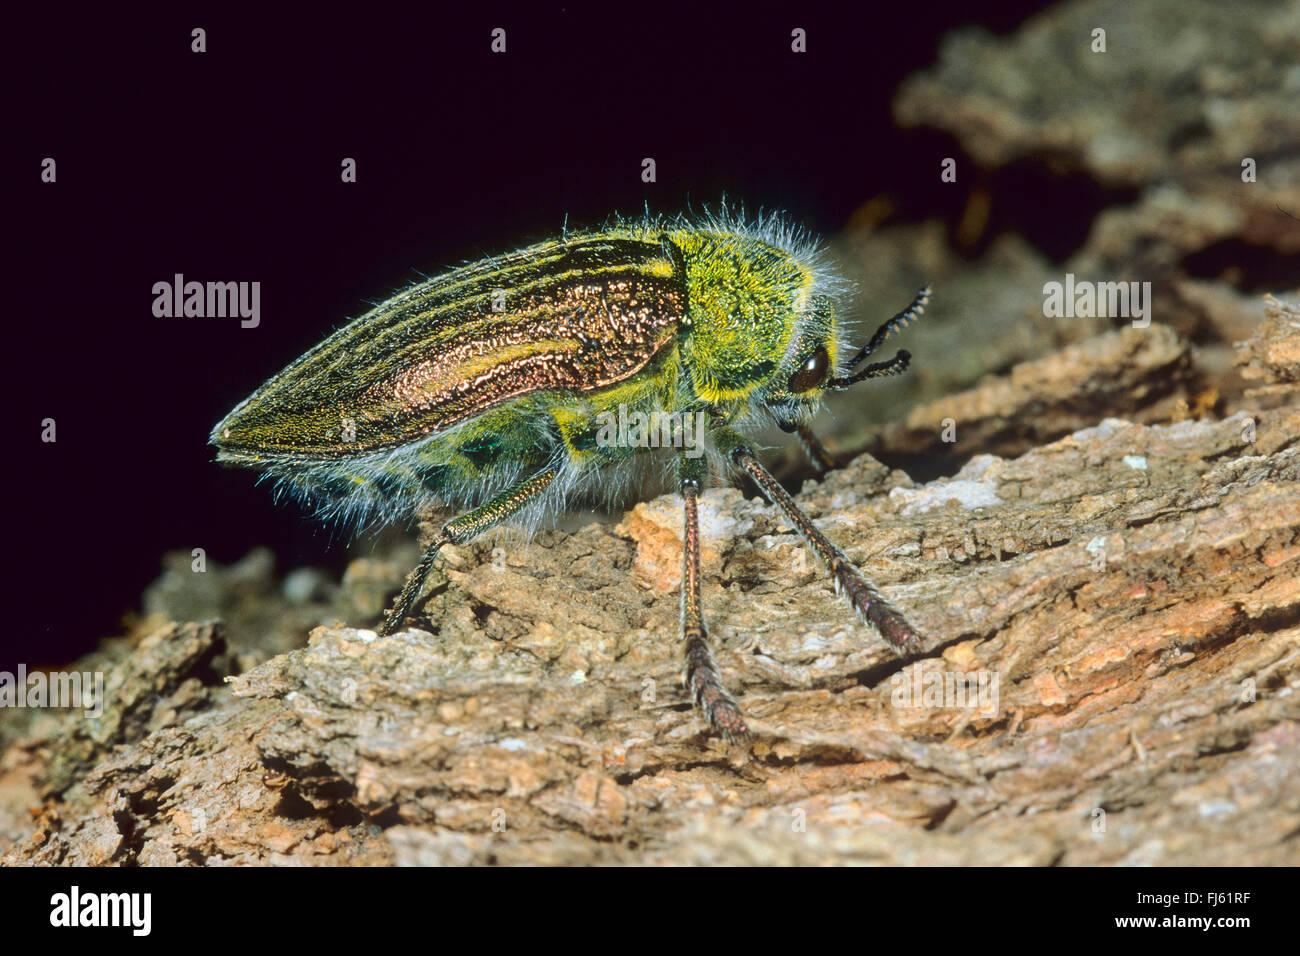 jewel beetle (Julodis pubescens subsp. yveni, Julodis pubescens subsp. iveni, Julodis pubescens yveni), on wood - Stock Image